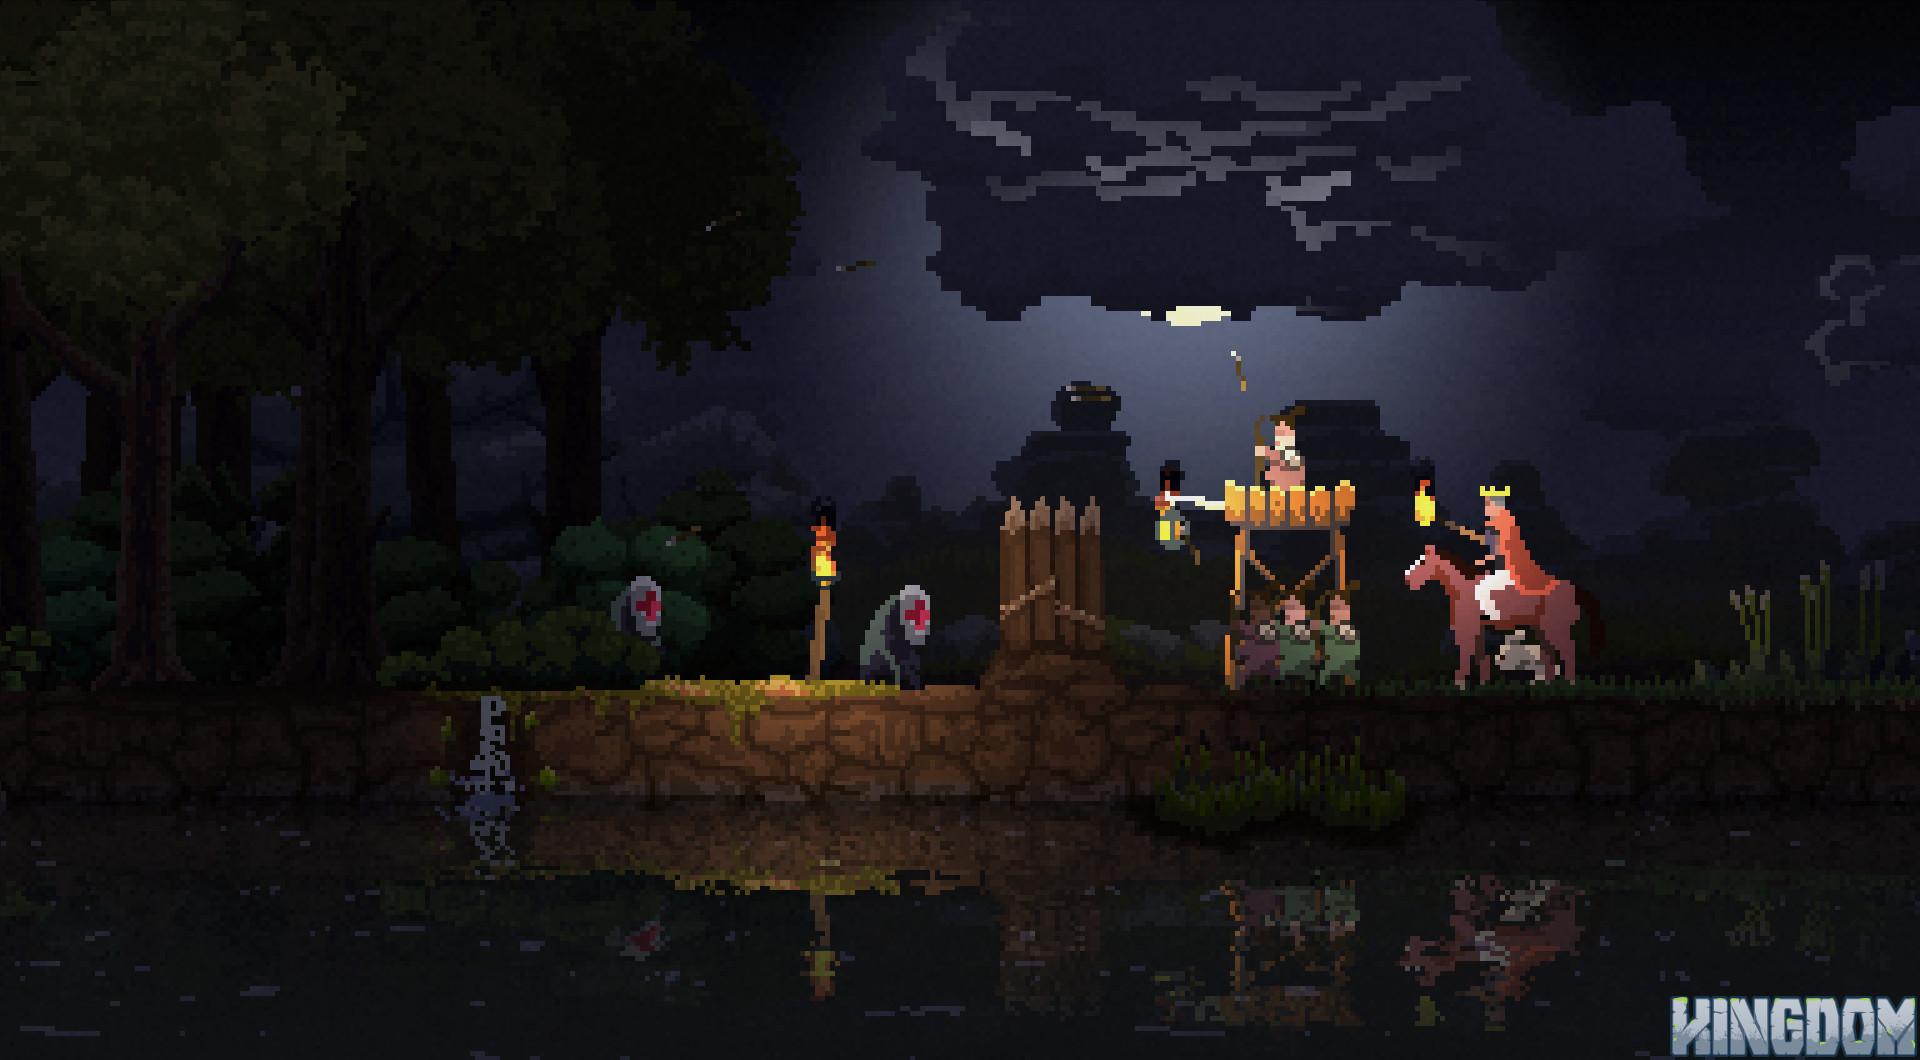 Kingdom screenshot 3